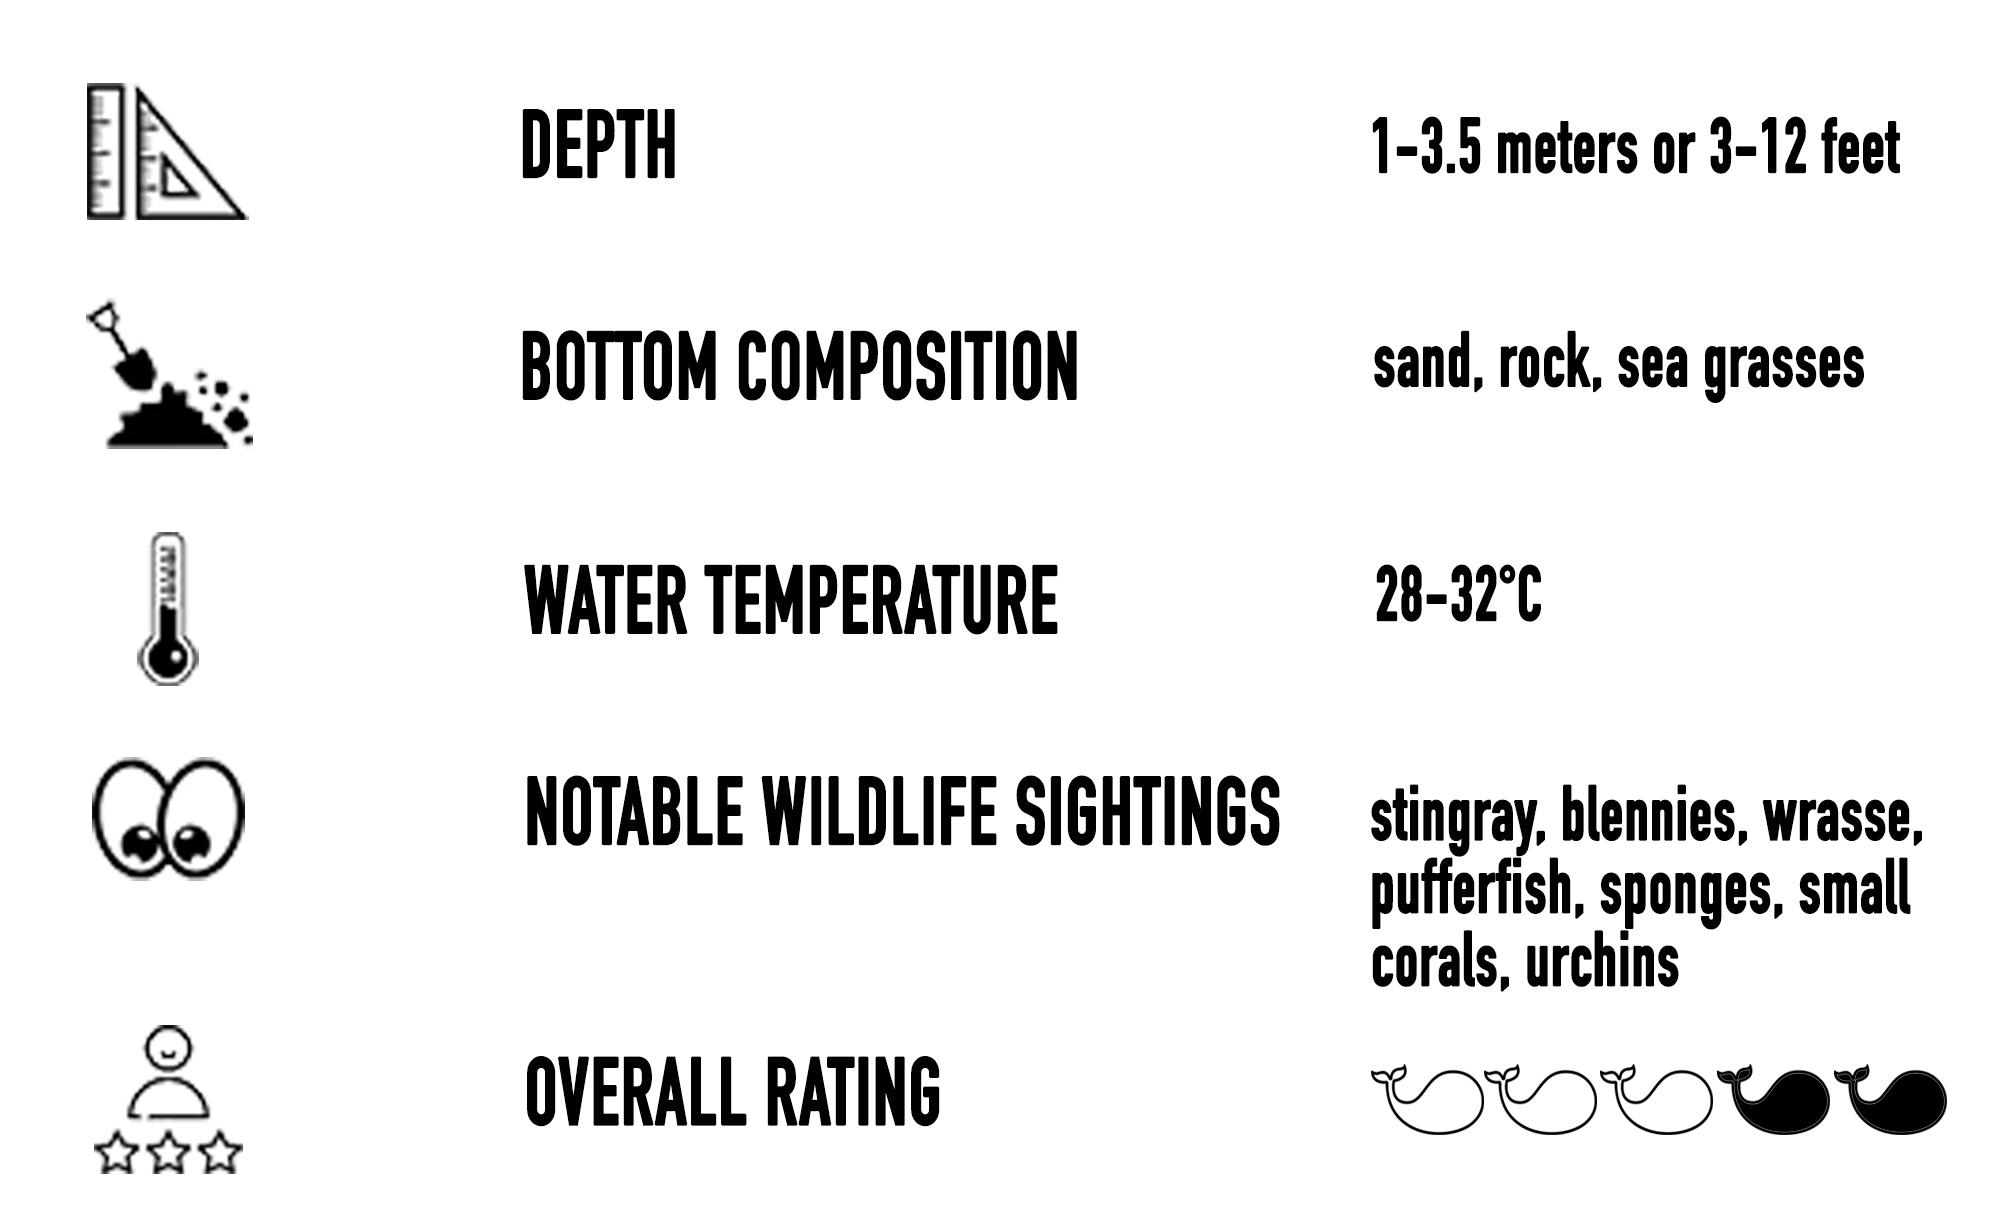 Playa Hermosa Snorkeling Site Underwater Statistics